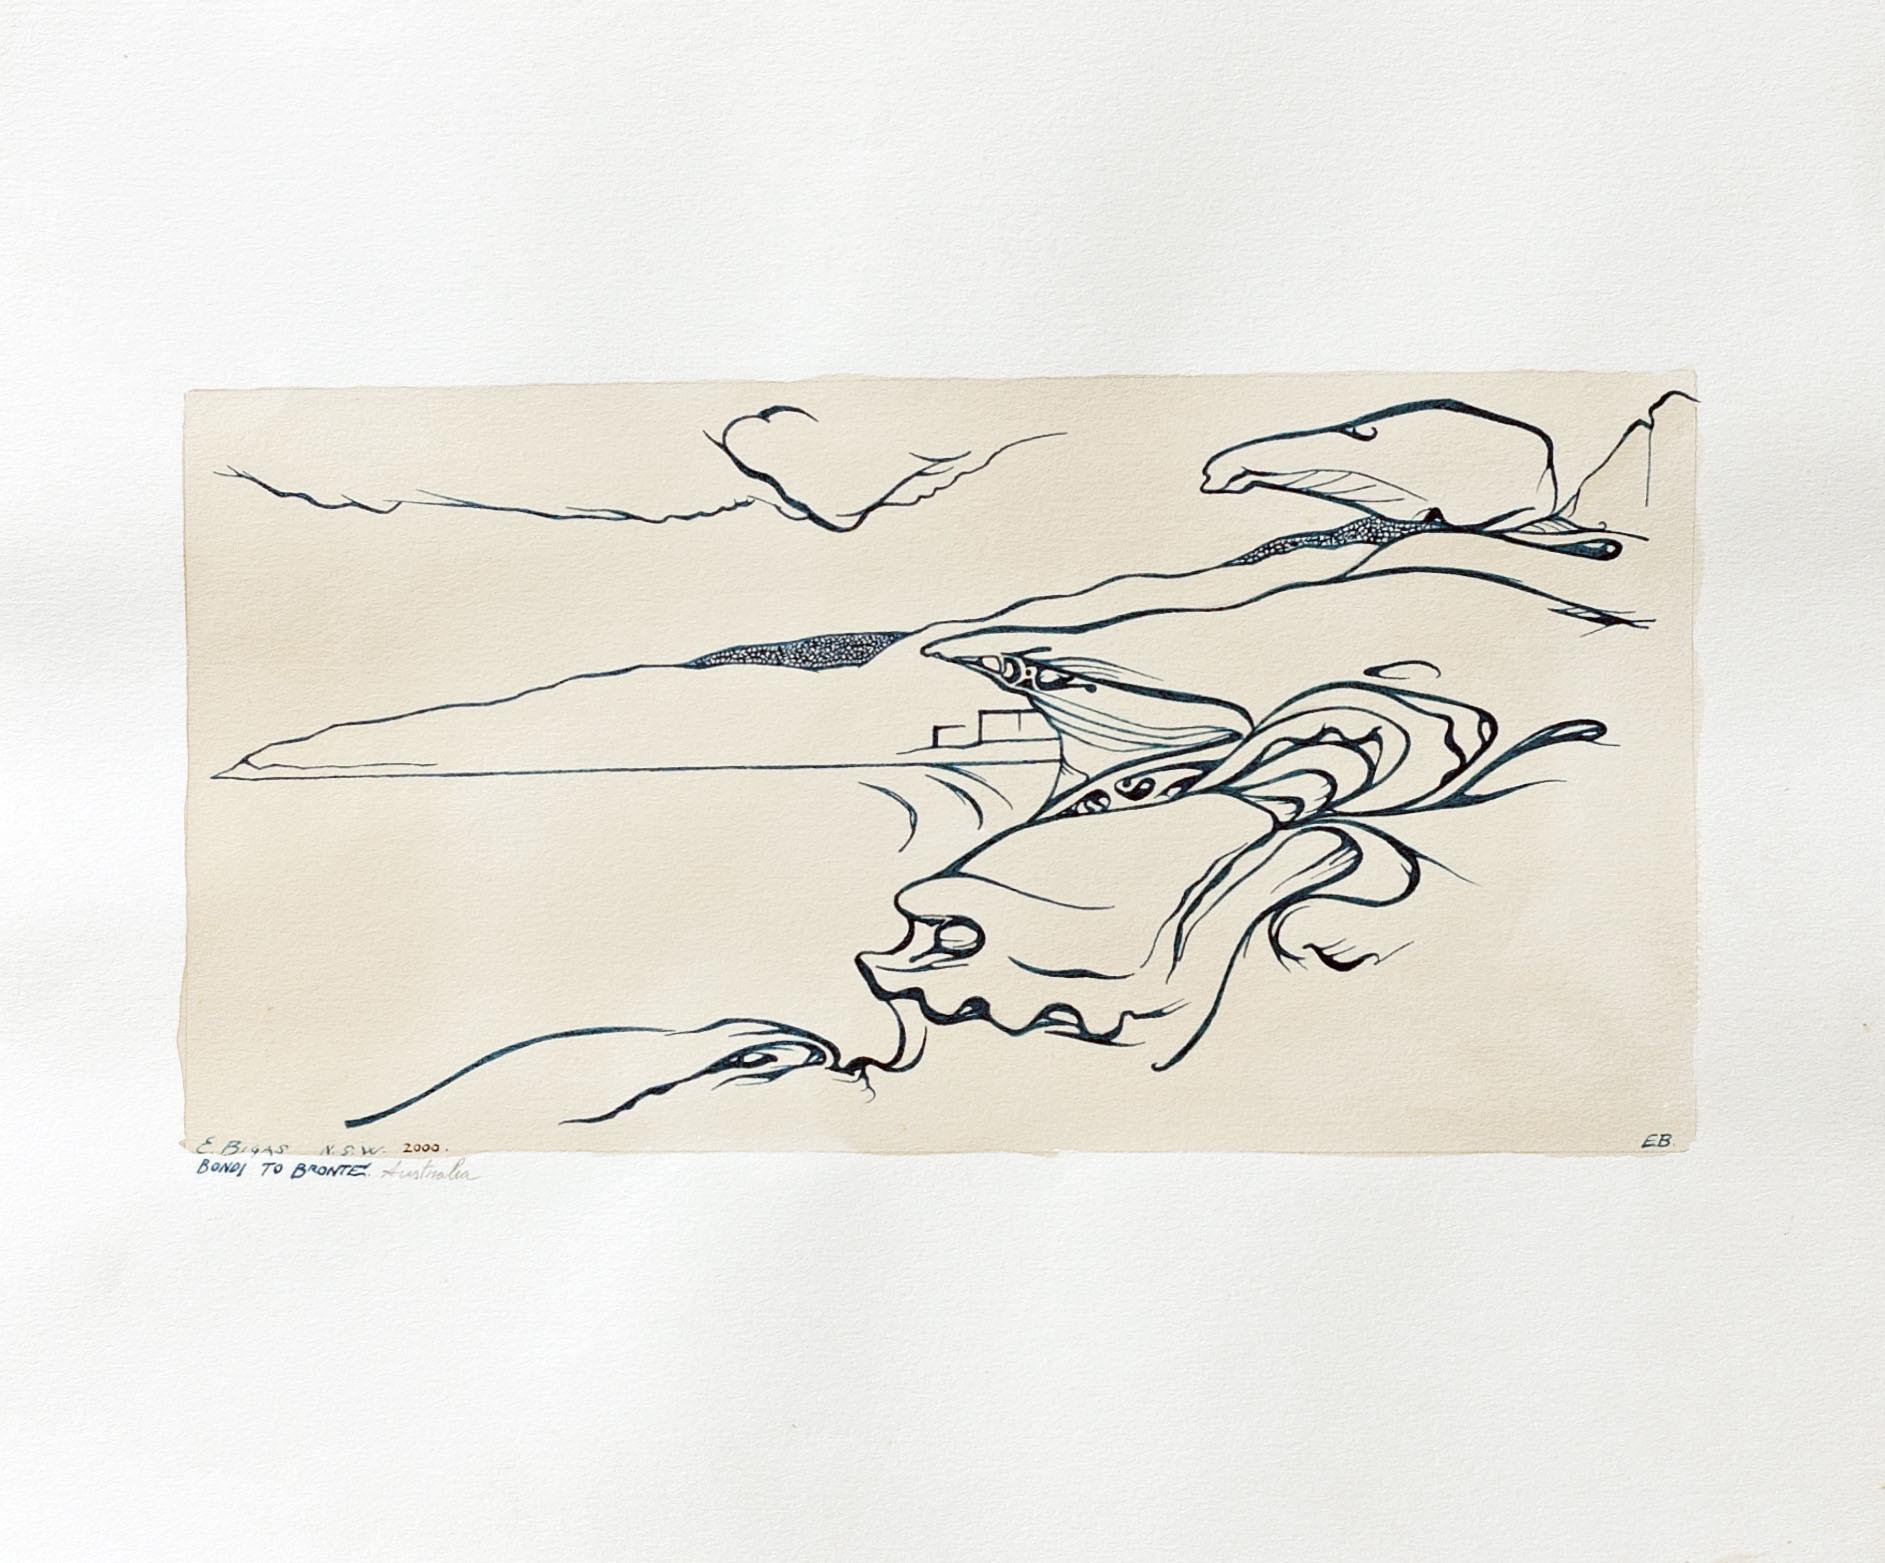 Bondi to Bronte 2000 24x28.5cm. Tea and Ink on paper